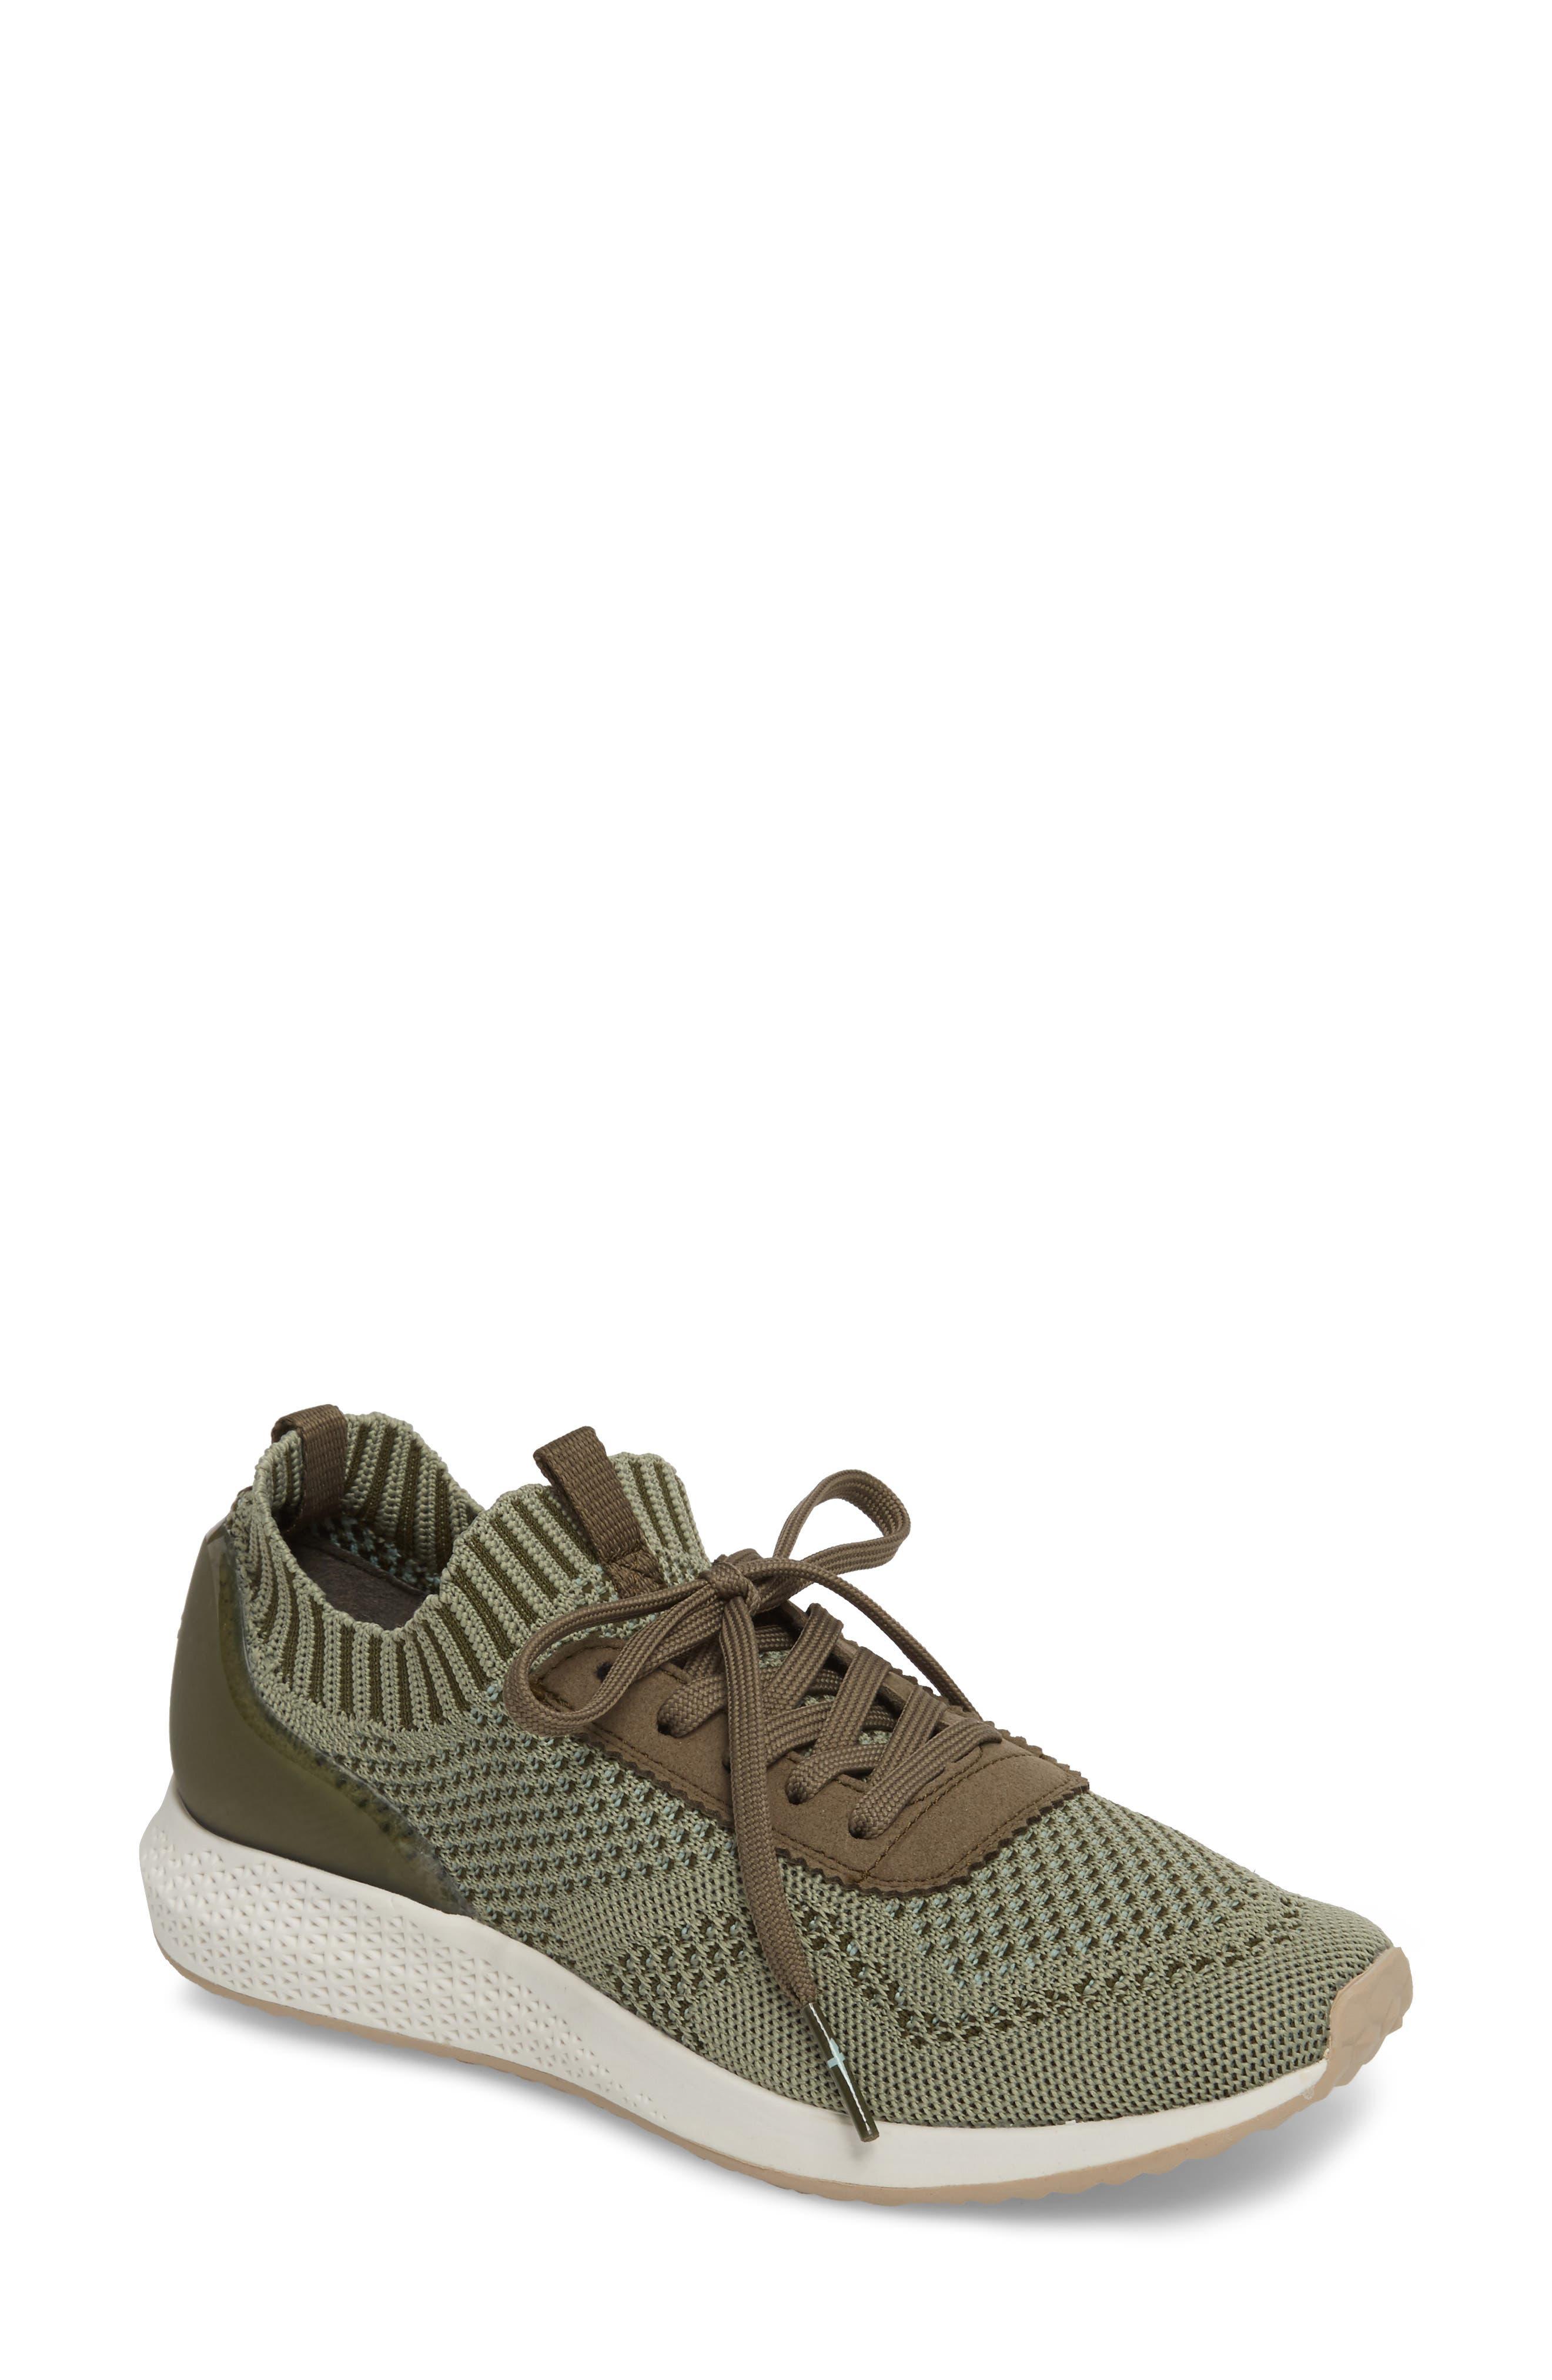 Tavia Sneaker,                             Main thumbnail 1, color,